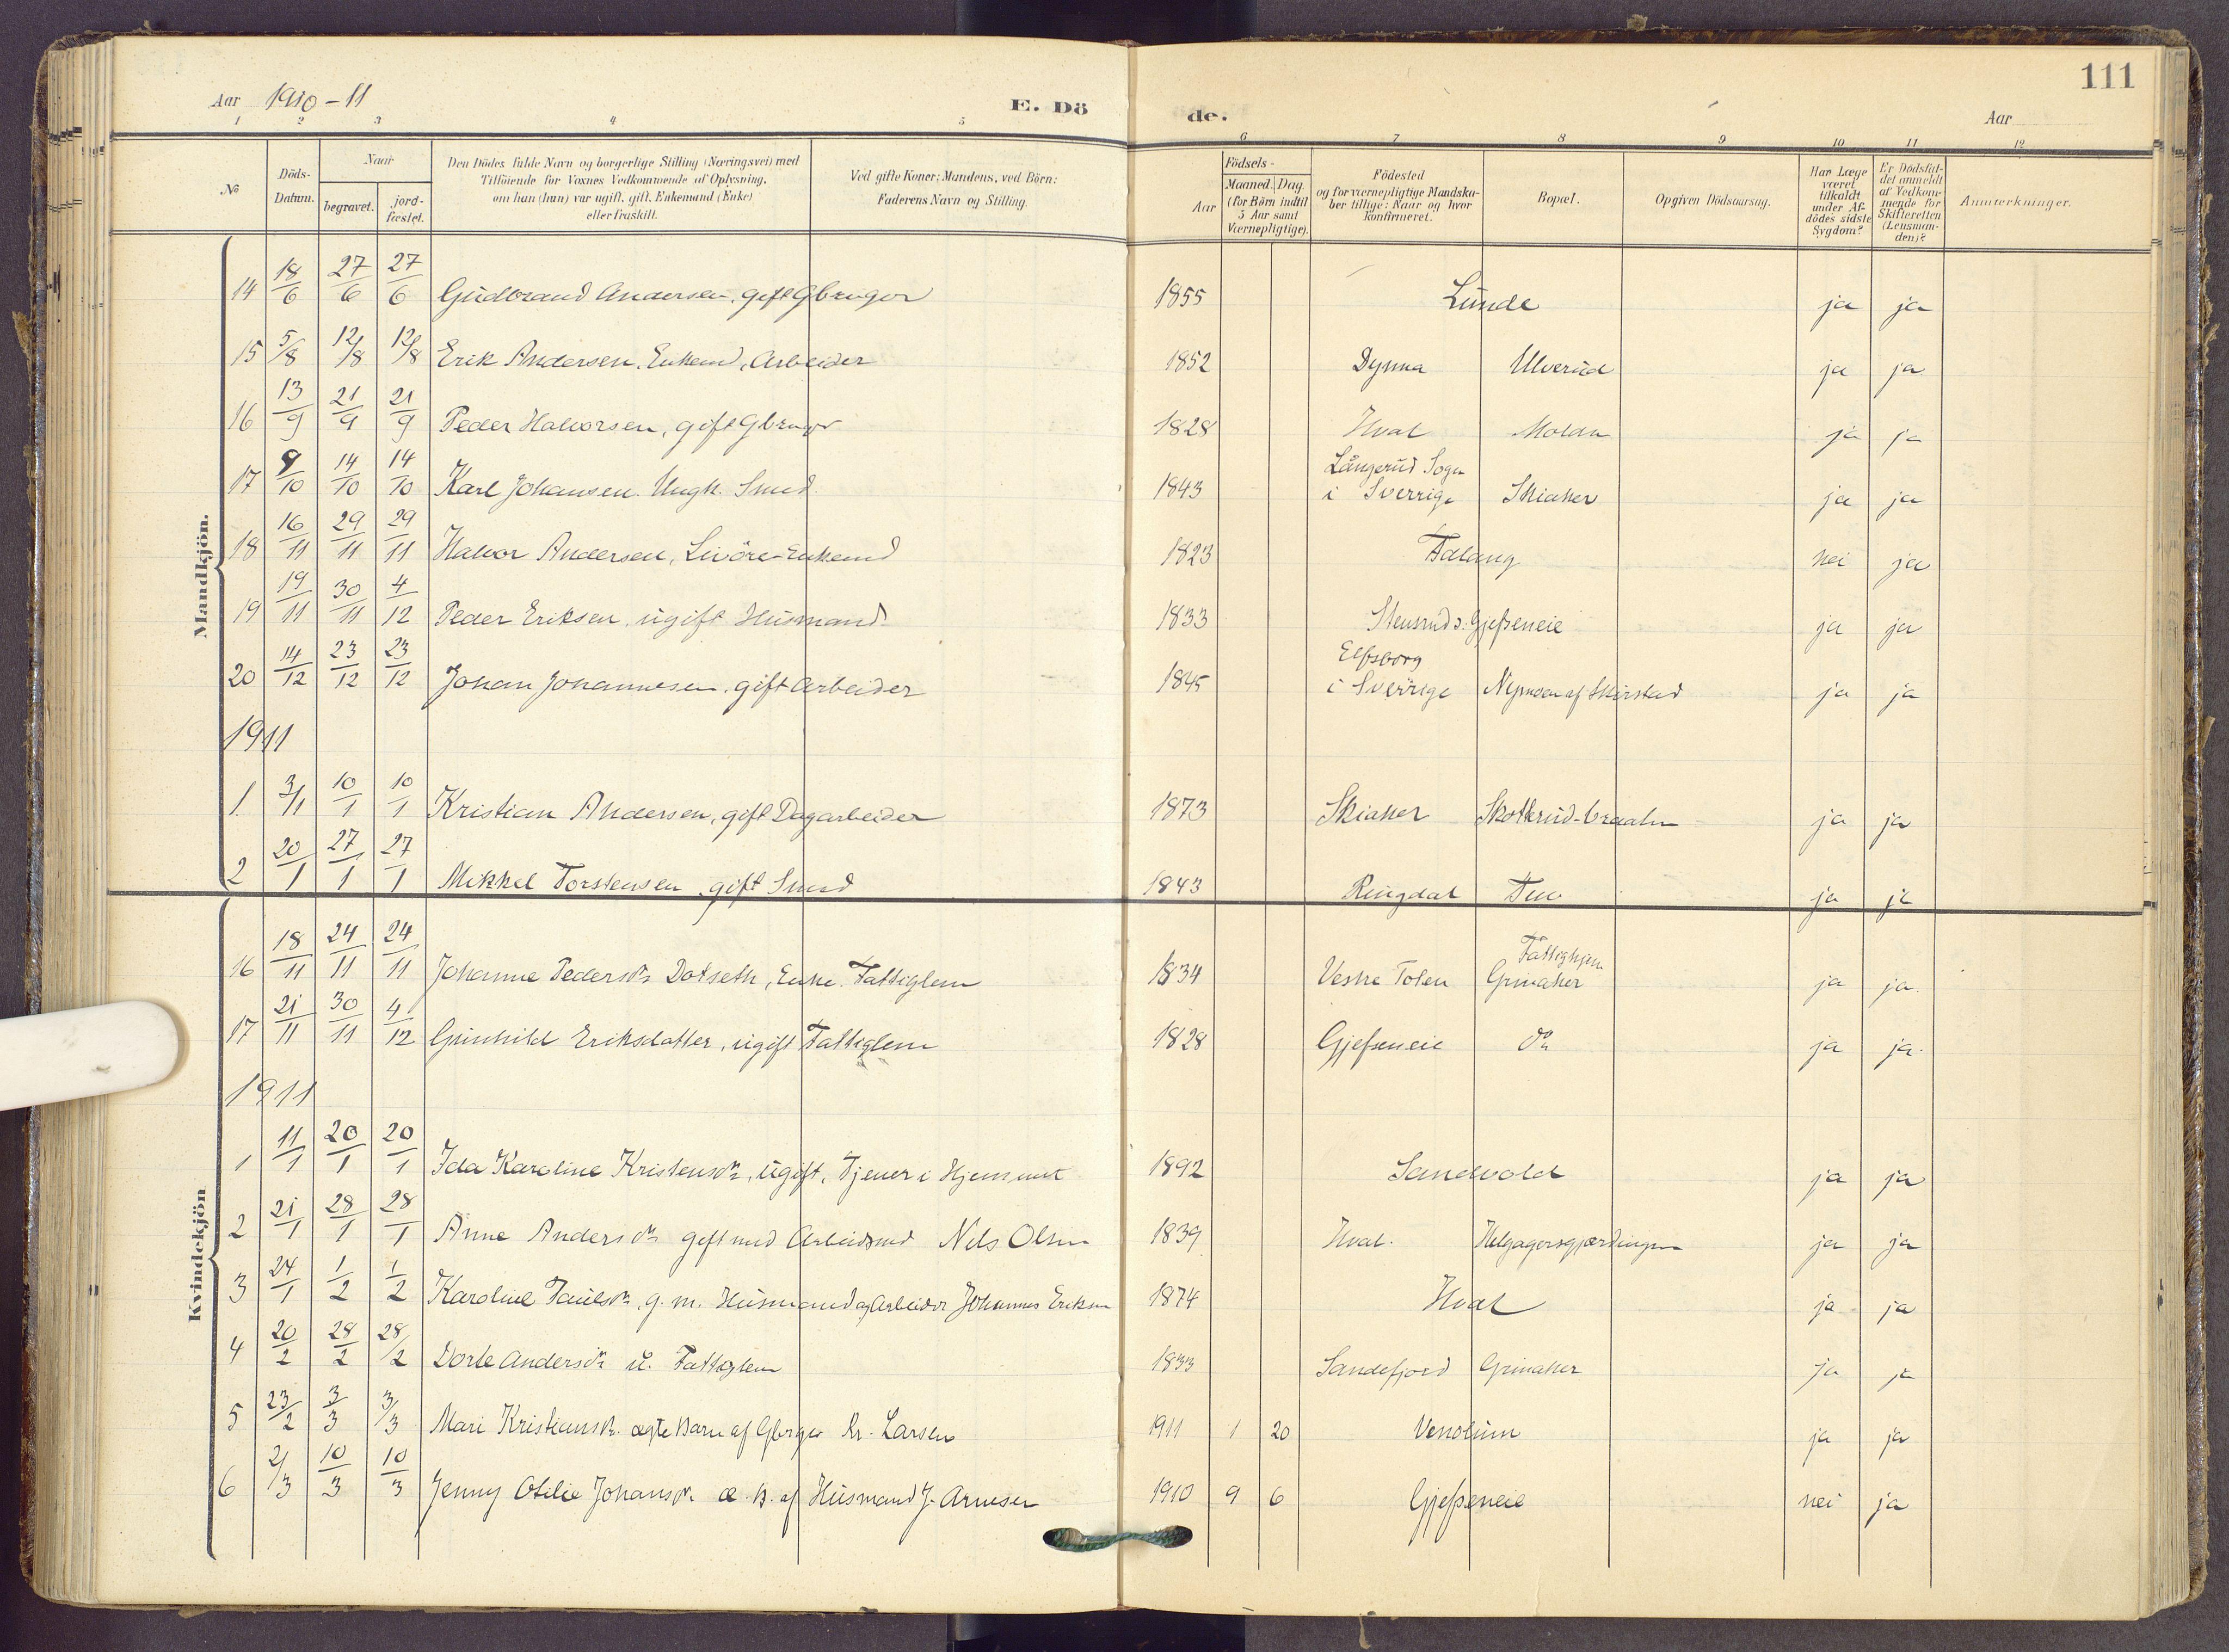 SAH, Gran prestekontor, Ministerialbok nr. 22, 1908-1918, s. 111